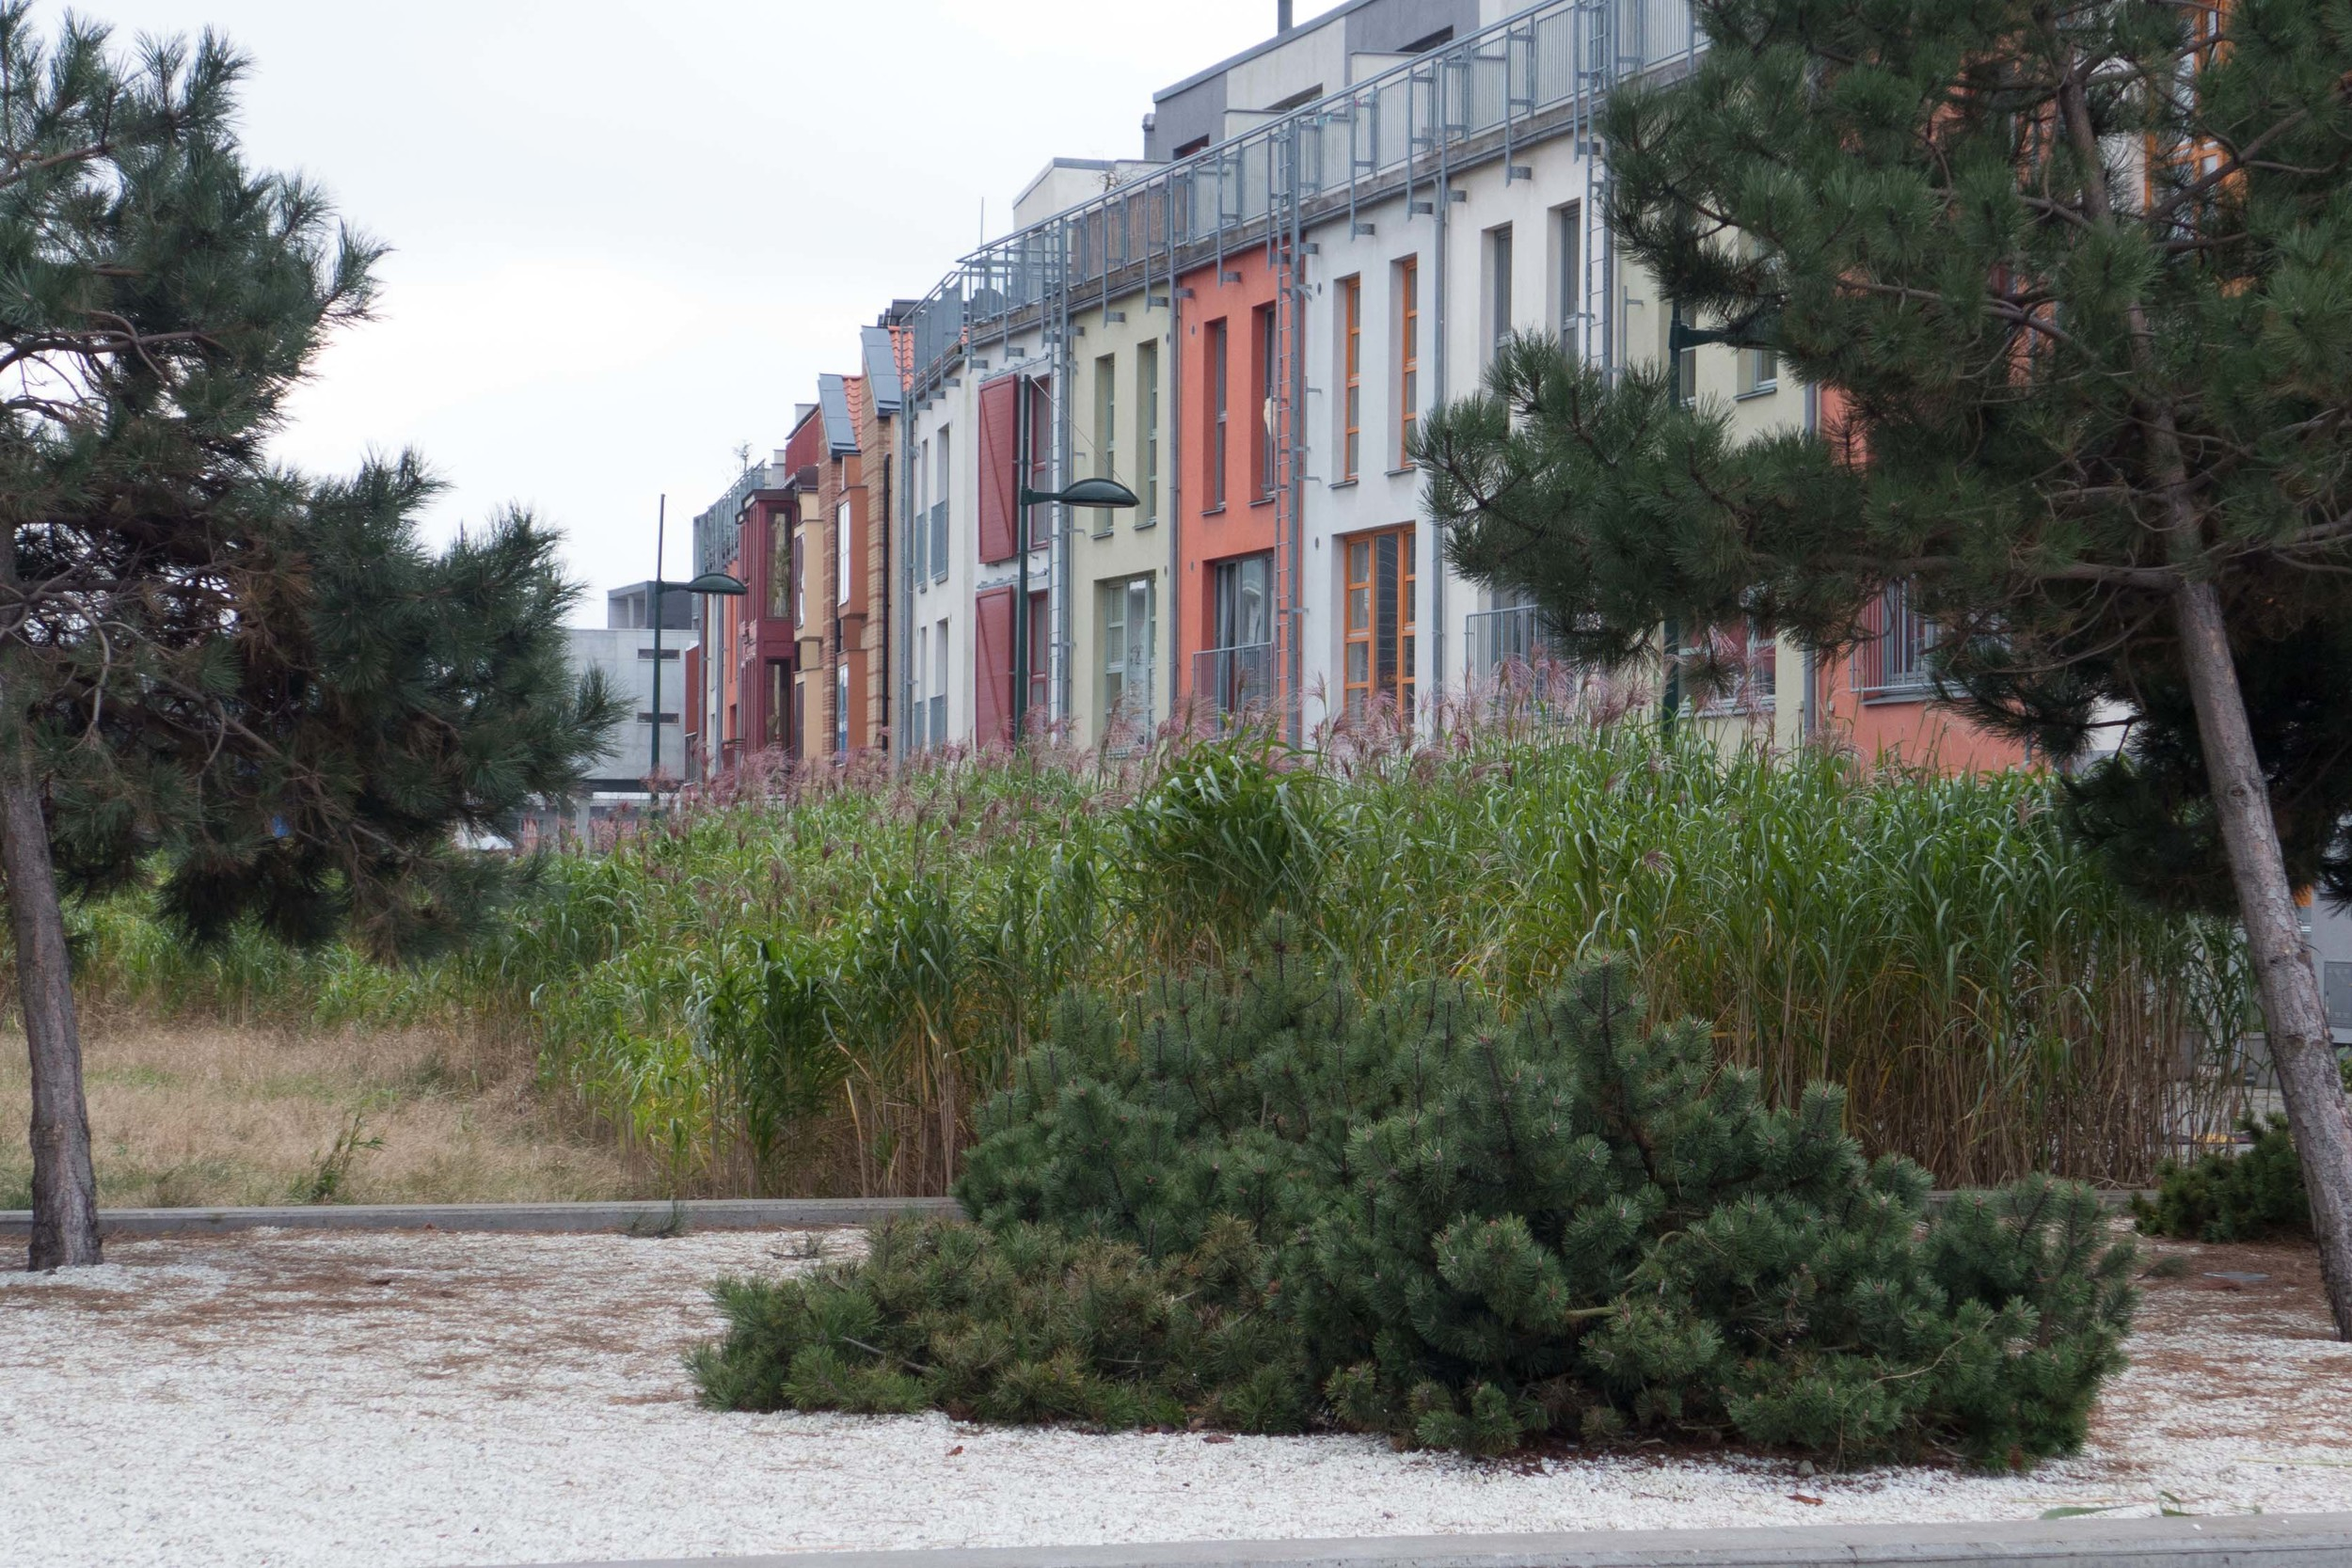 Malmo courtyard 3.jpg